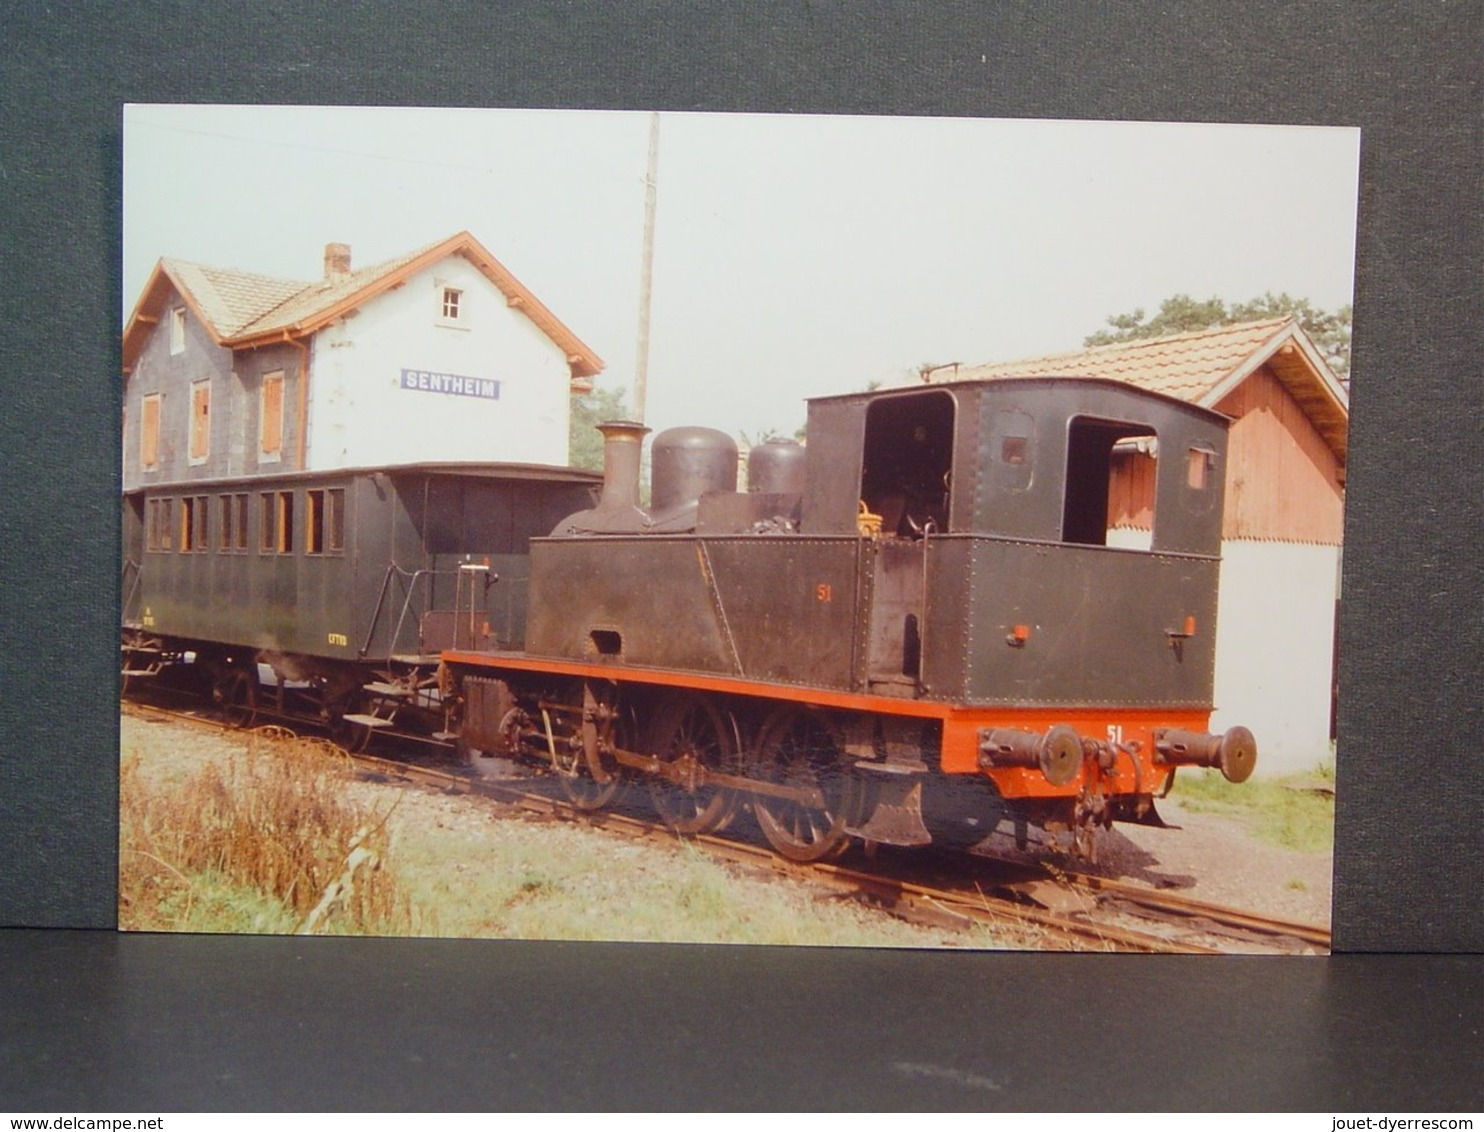 Locomotive à Vapeur 51 à Sentheim Photo N° 77-140-11 - Eisenbahnen